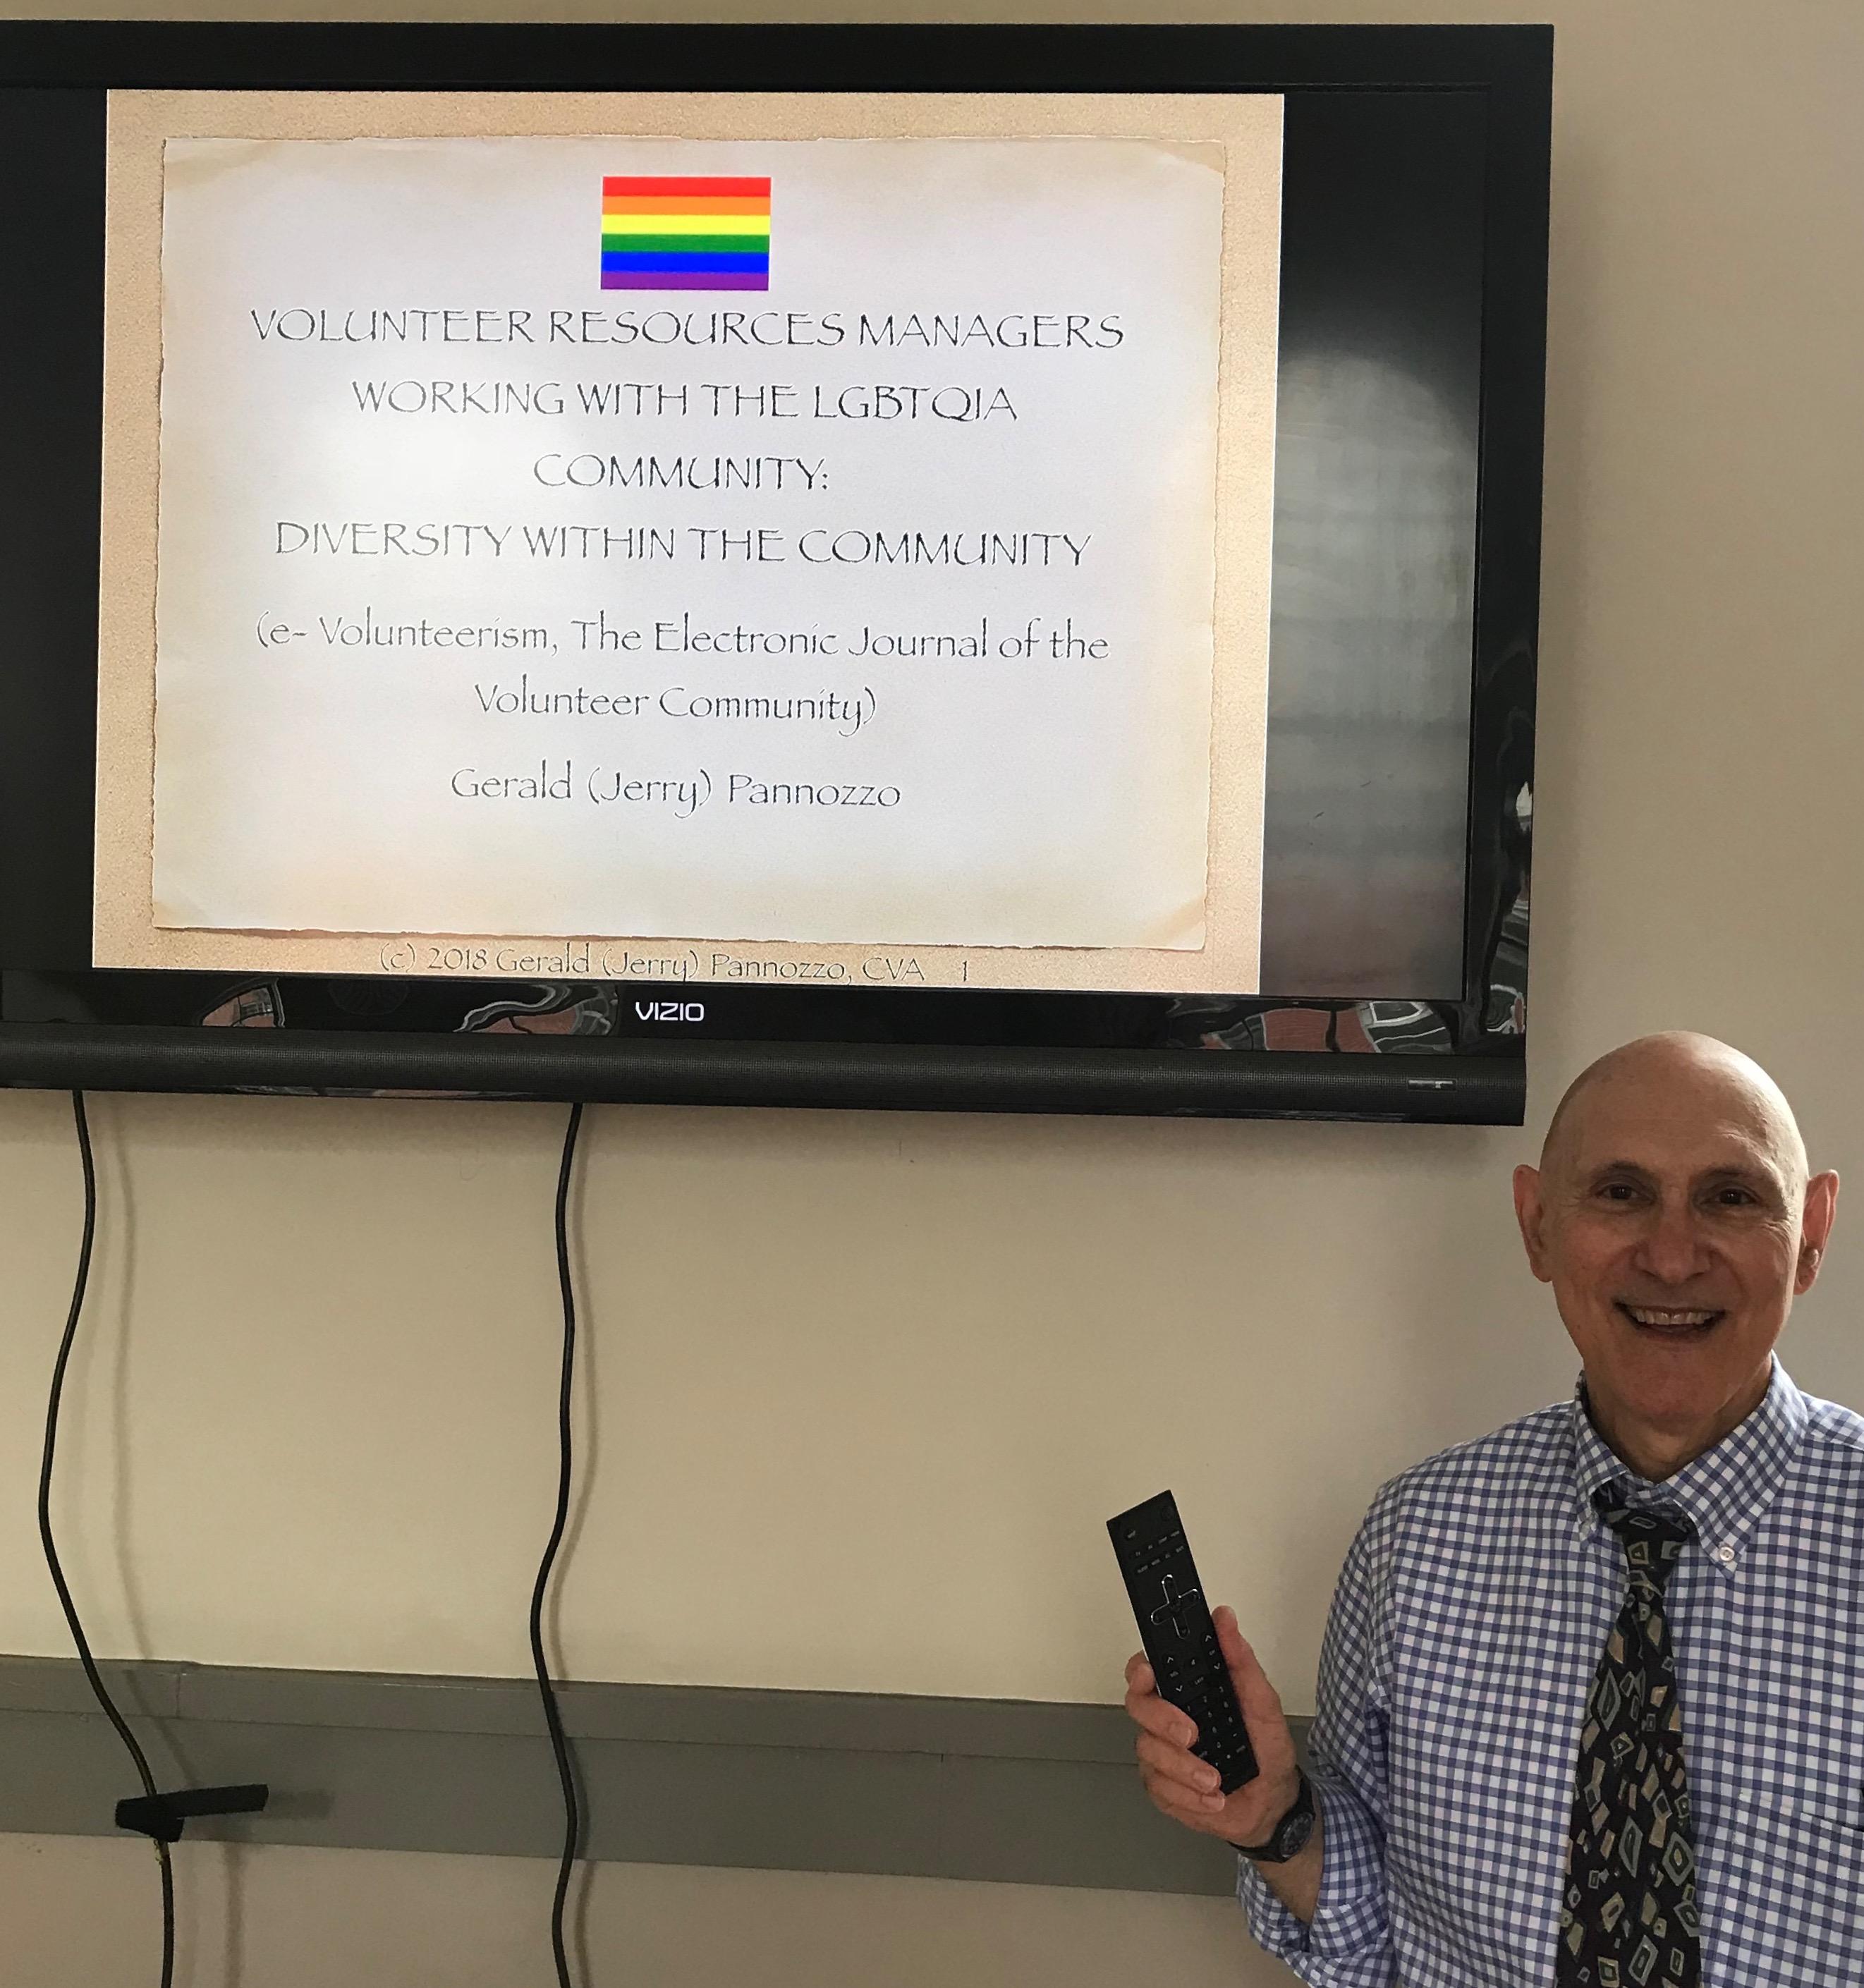 Workshop And Speaking History Jerry Pannozzo Cva